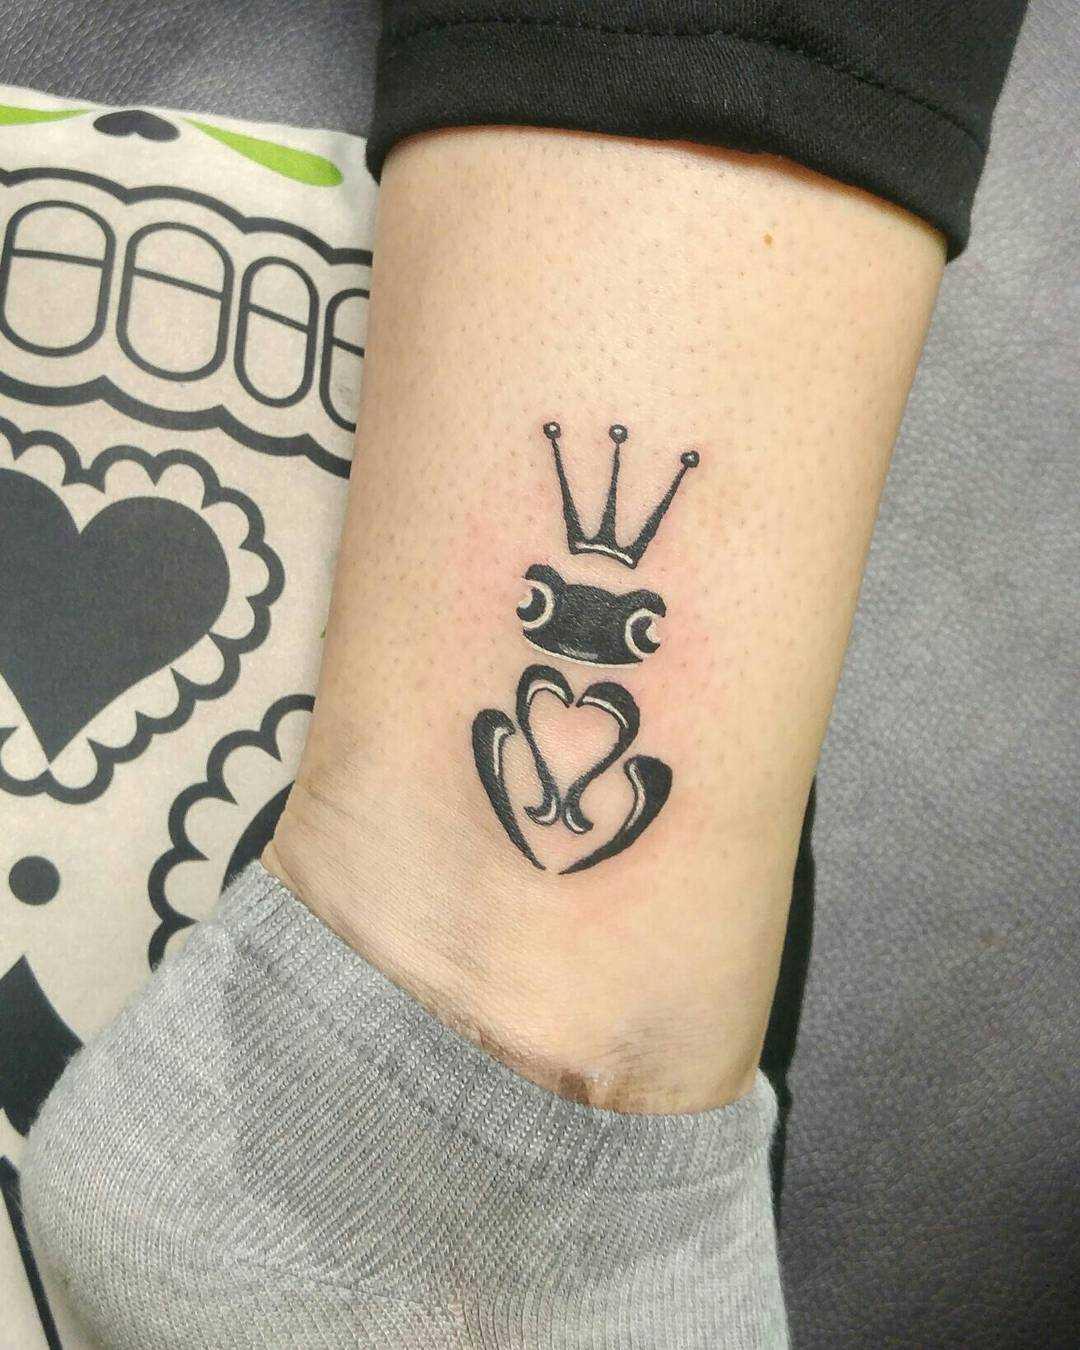 Uma pequena tatuagem sapo t menina